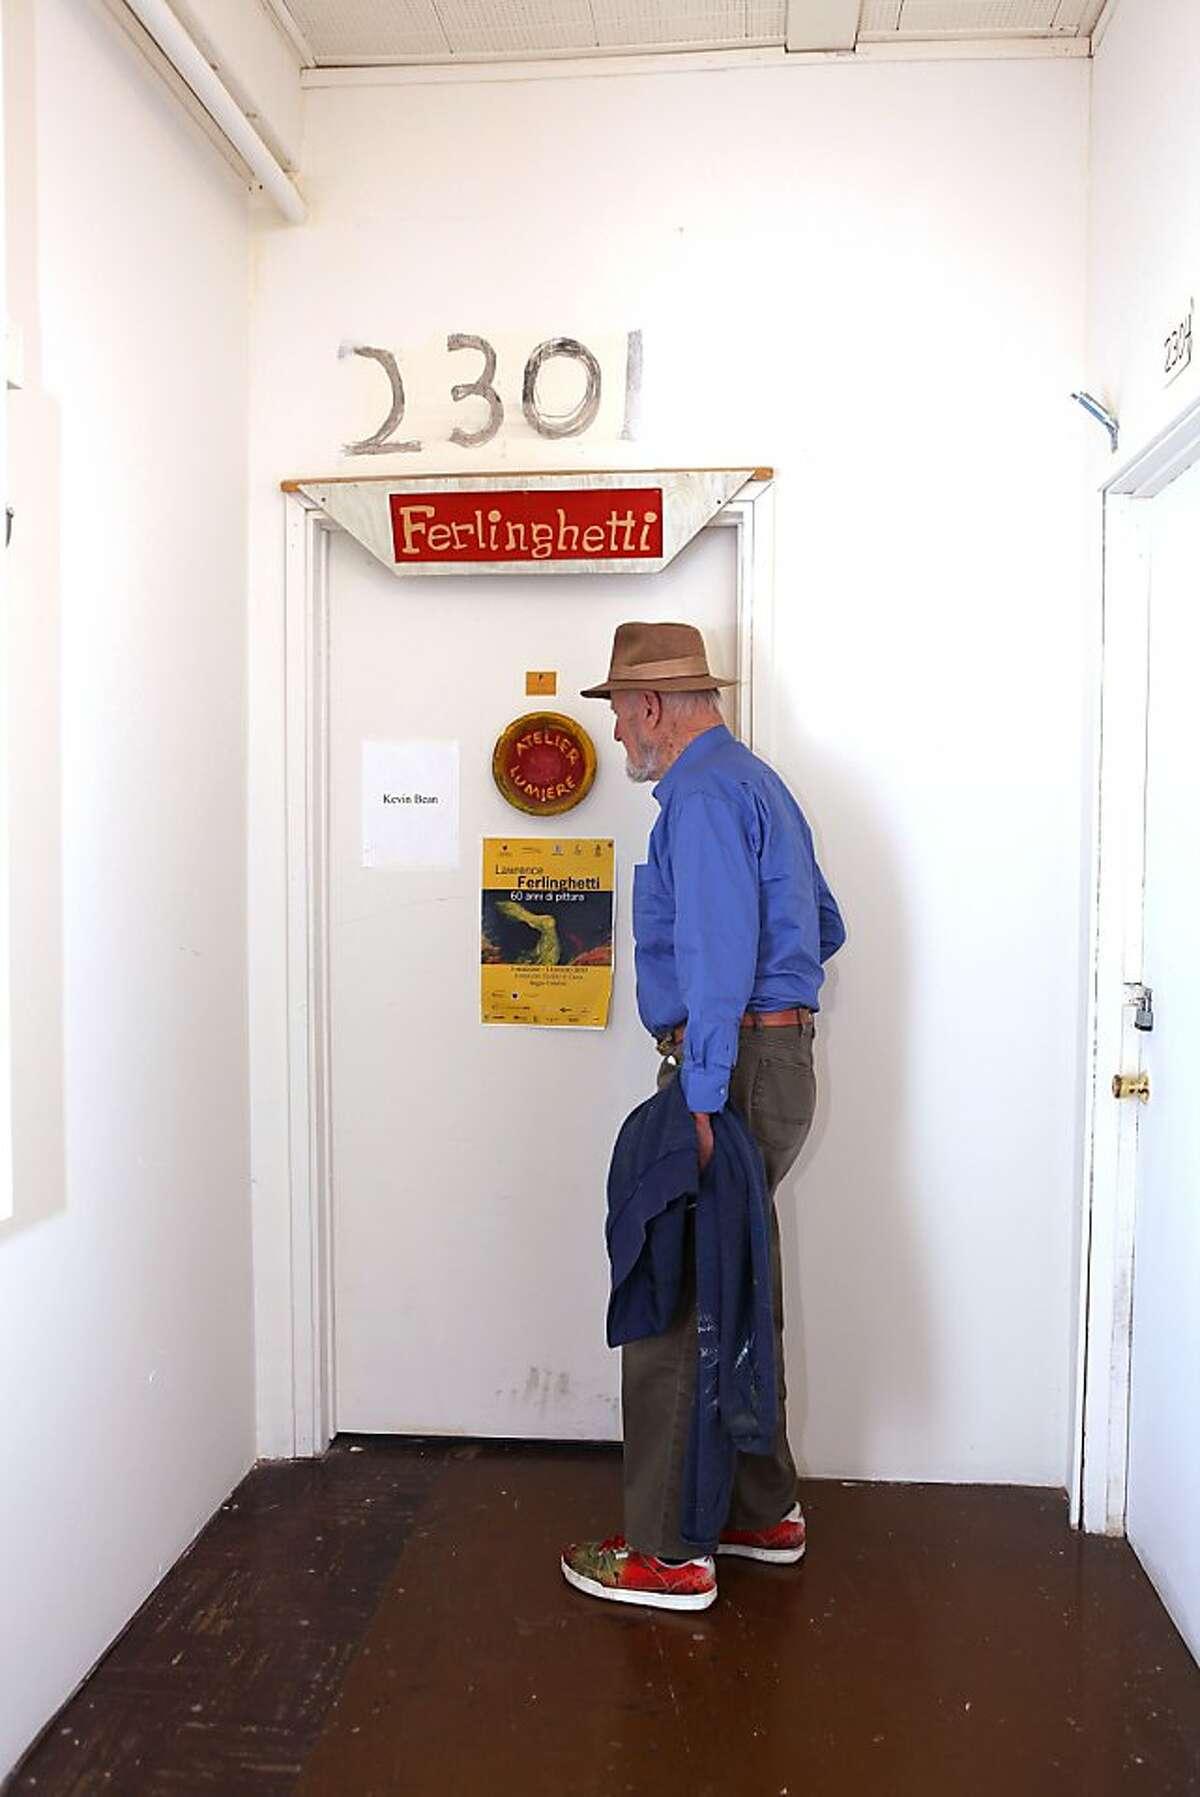 Legendary poet, artist, and publisher Lawrence Ferlinghetti going into his art studio in San Francisco, Calif., on Monday, September 10, 2012.